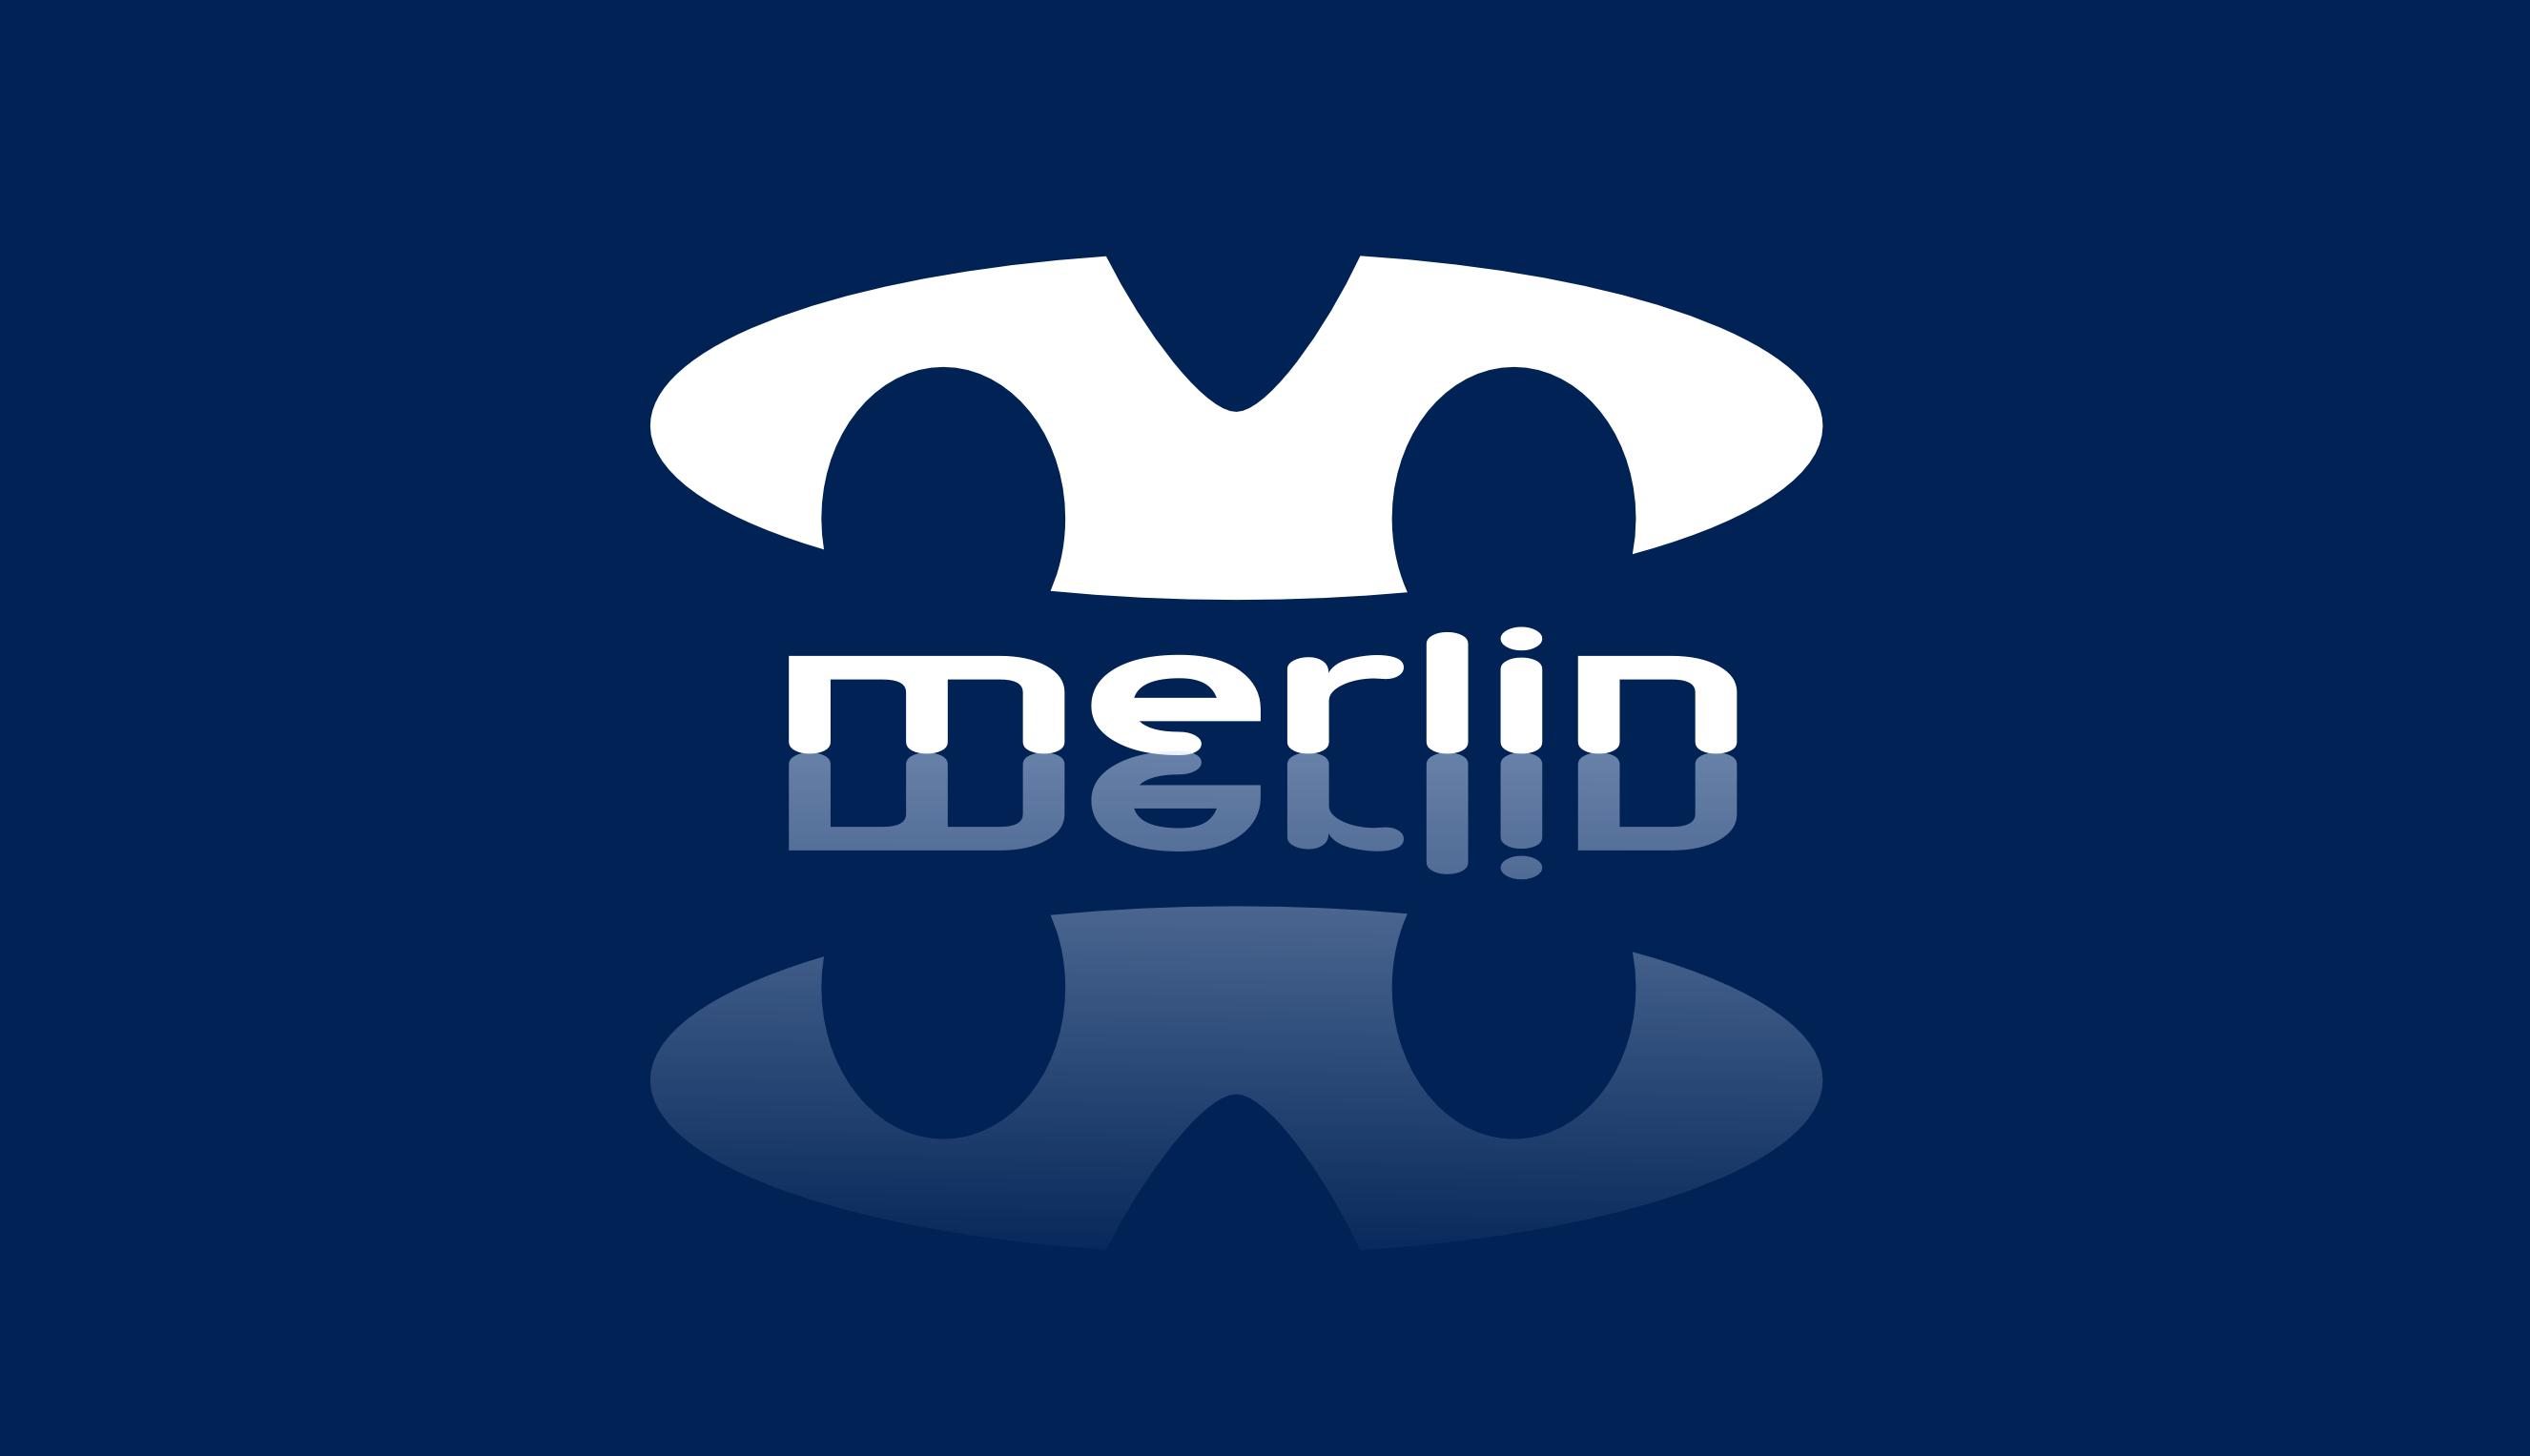 Logo Design by Arindam Khanda - Entry No. 147 in the Logo Design Contest Imaginative Logo Design for Merlin.